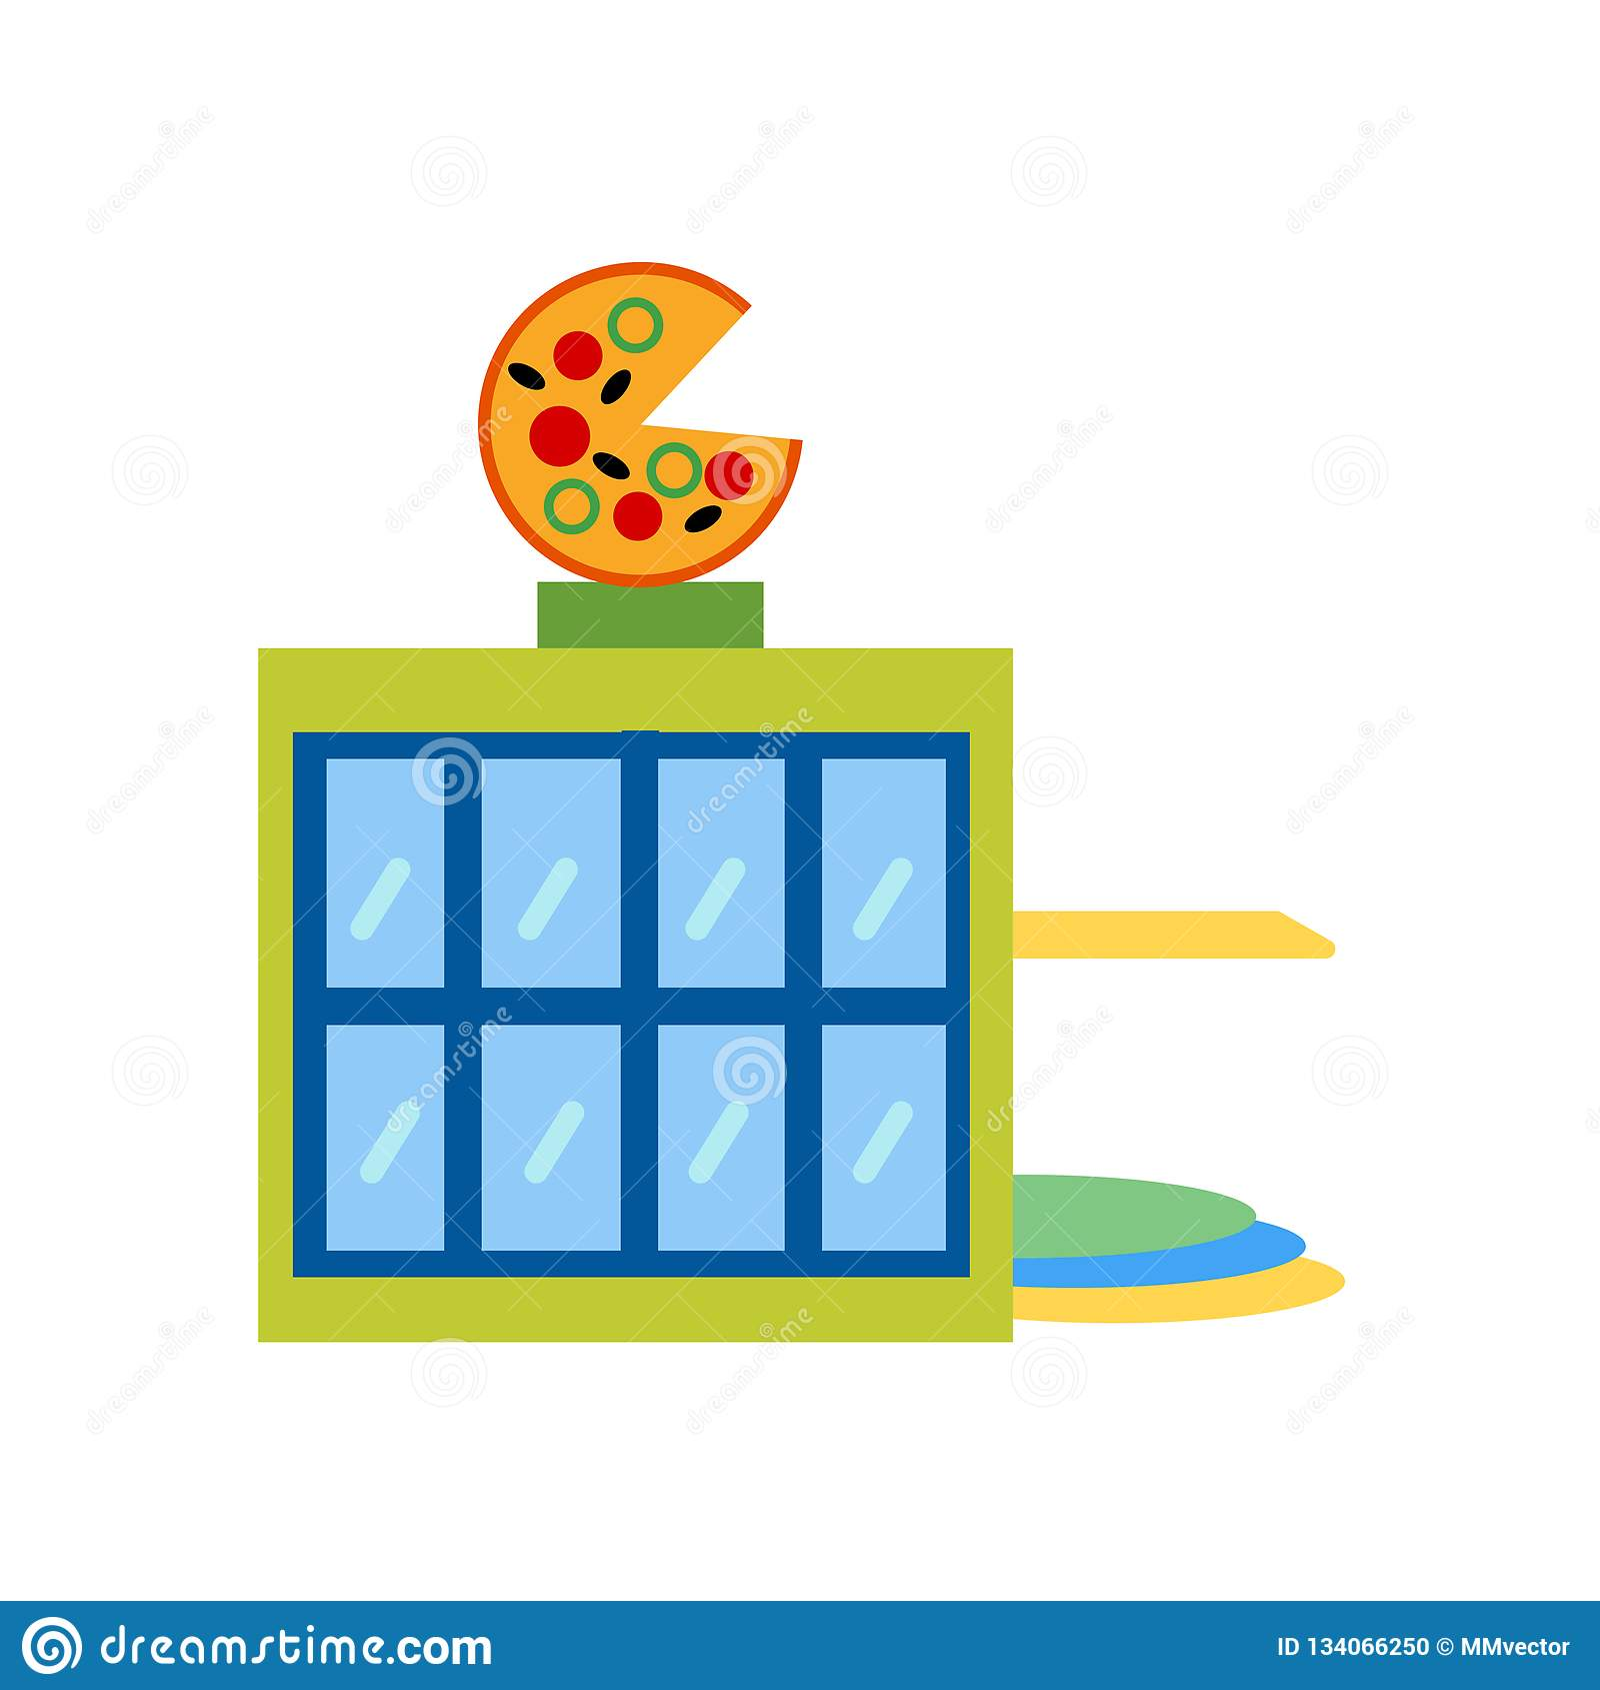 Pizzeria σημάδι και σύμβολο εικονιδίων διανυσματικό που απομονώνονται στο άσπρο υπόβαθρο, έννοια λογότυπων Pizzeria